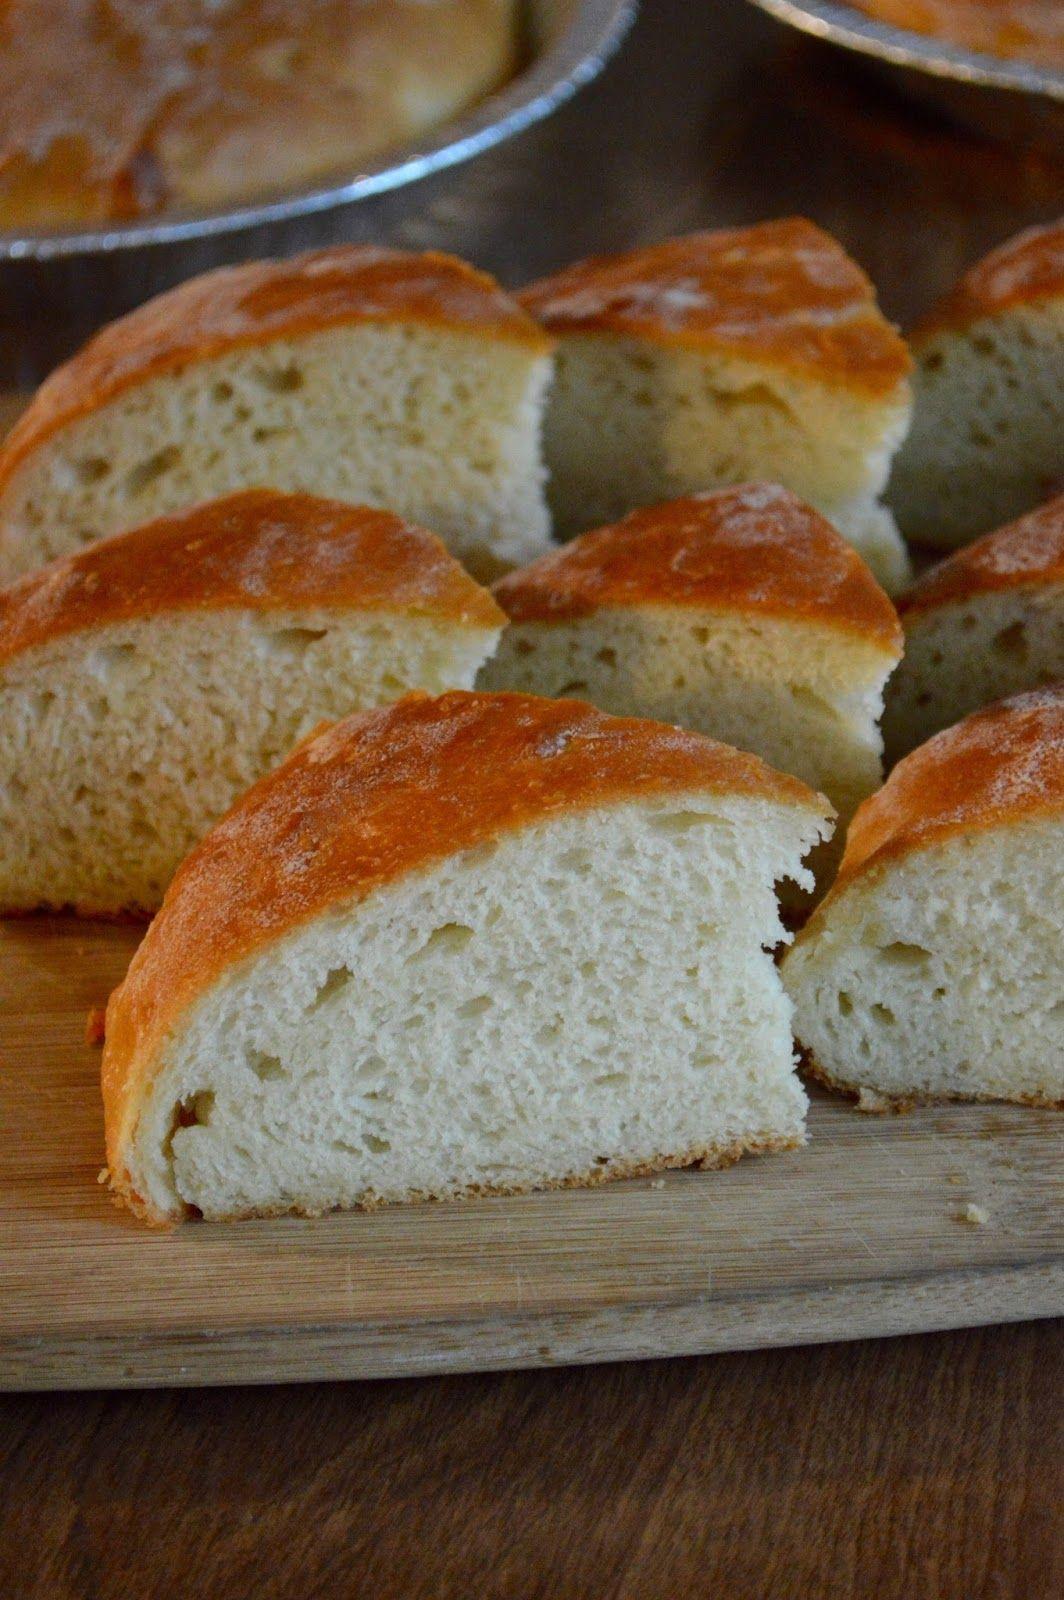 Heritage Schoolhouse: Copycat Kings Hawaiian Bread